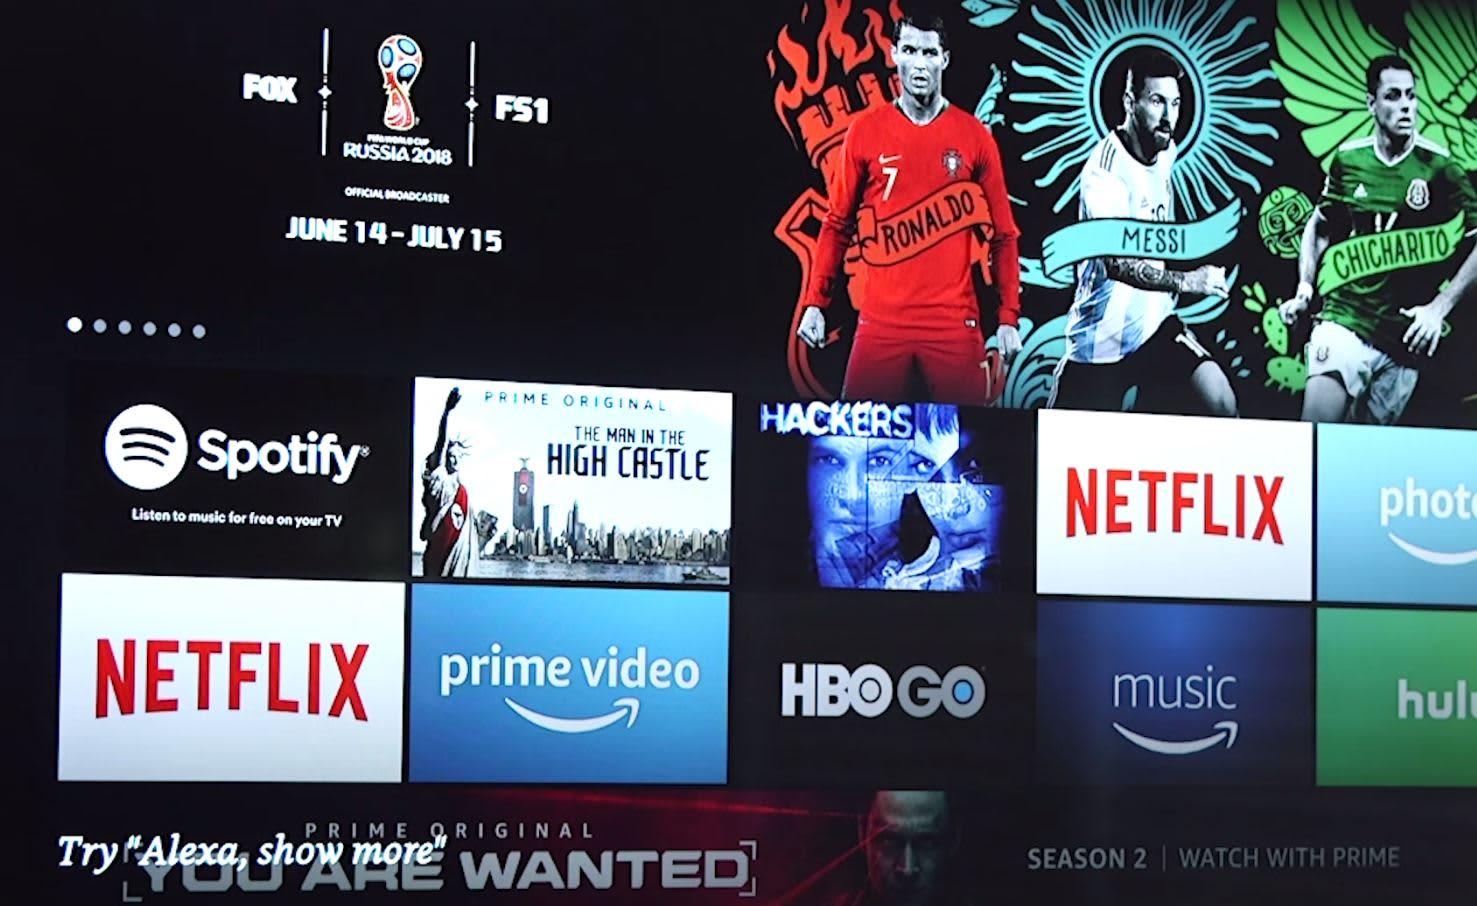 CNBC Tech: Fire TV Cube review 7